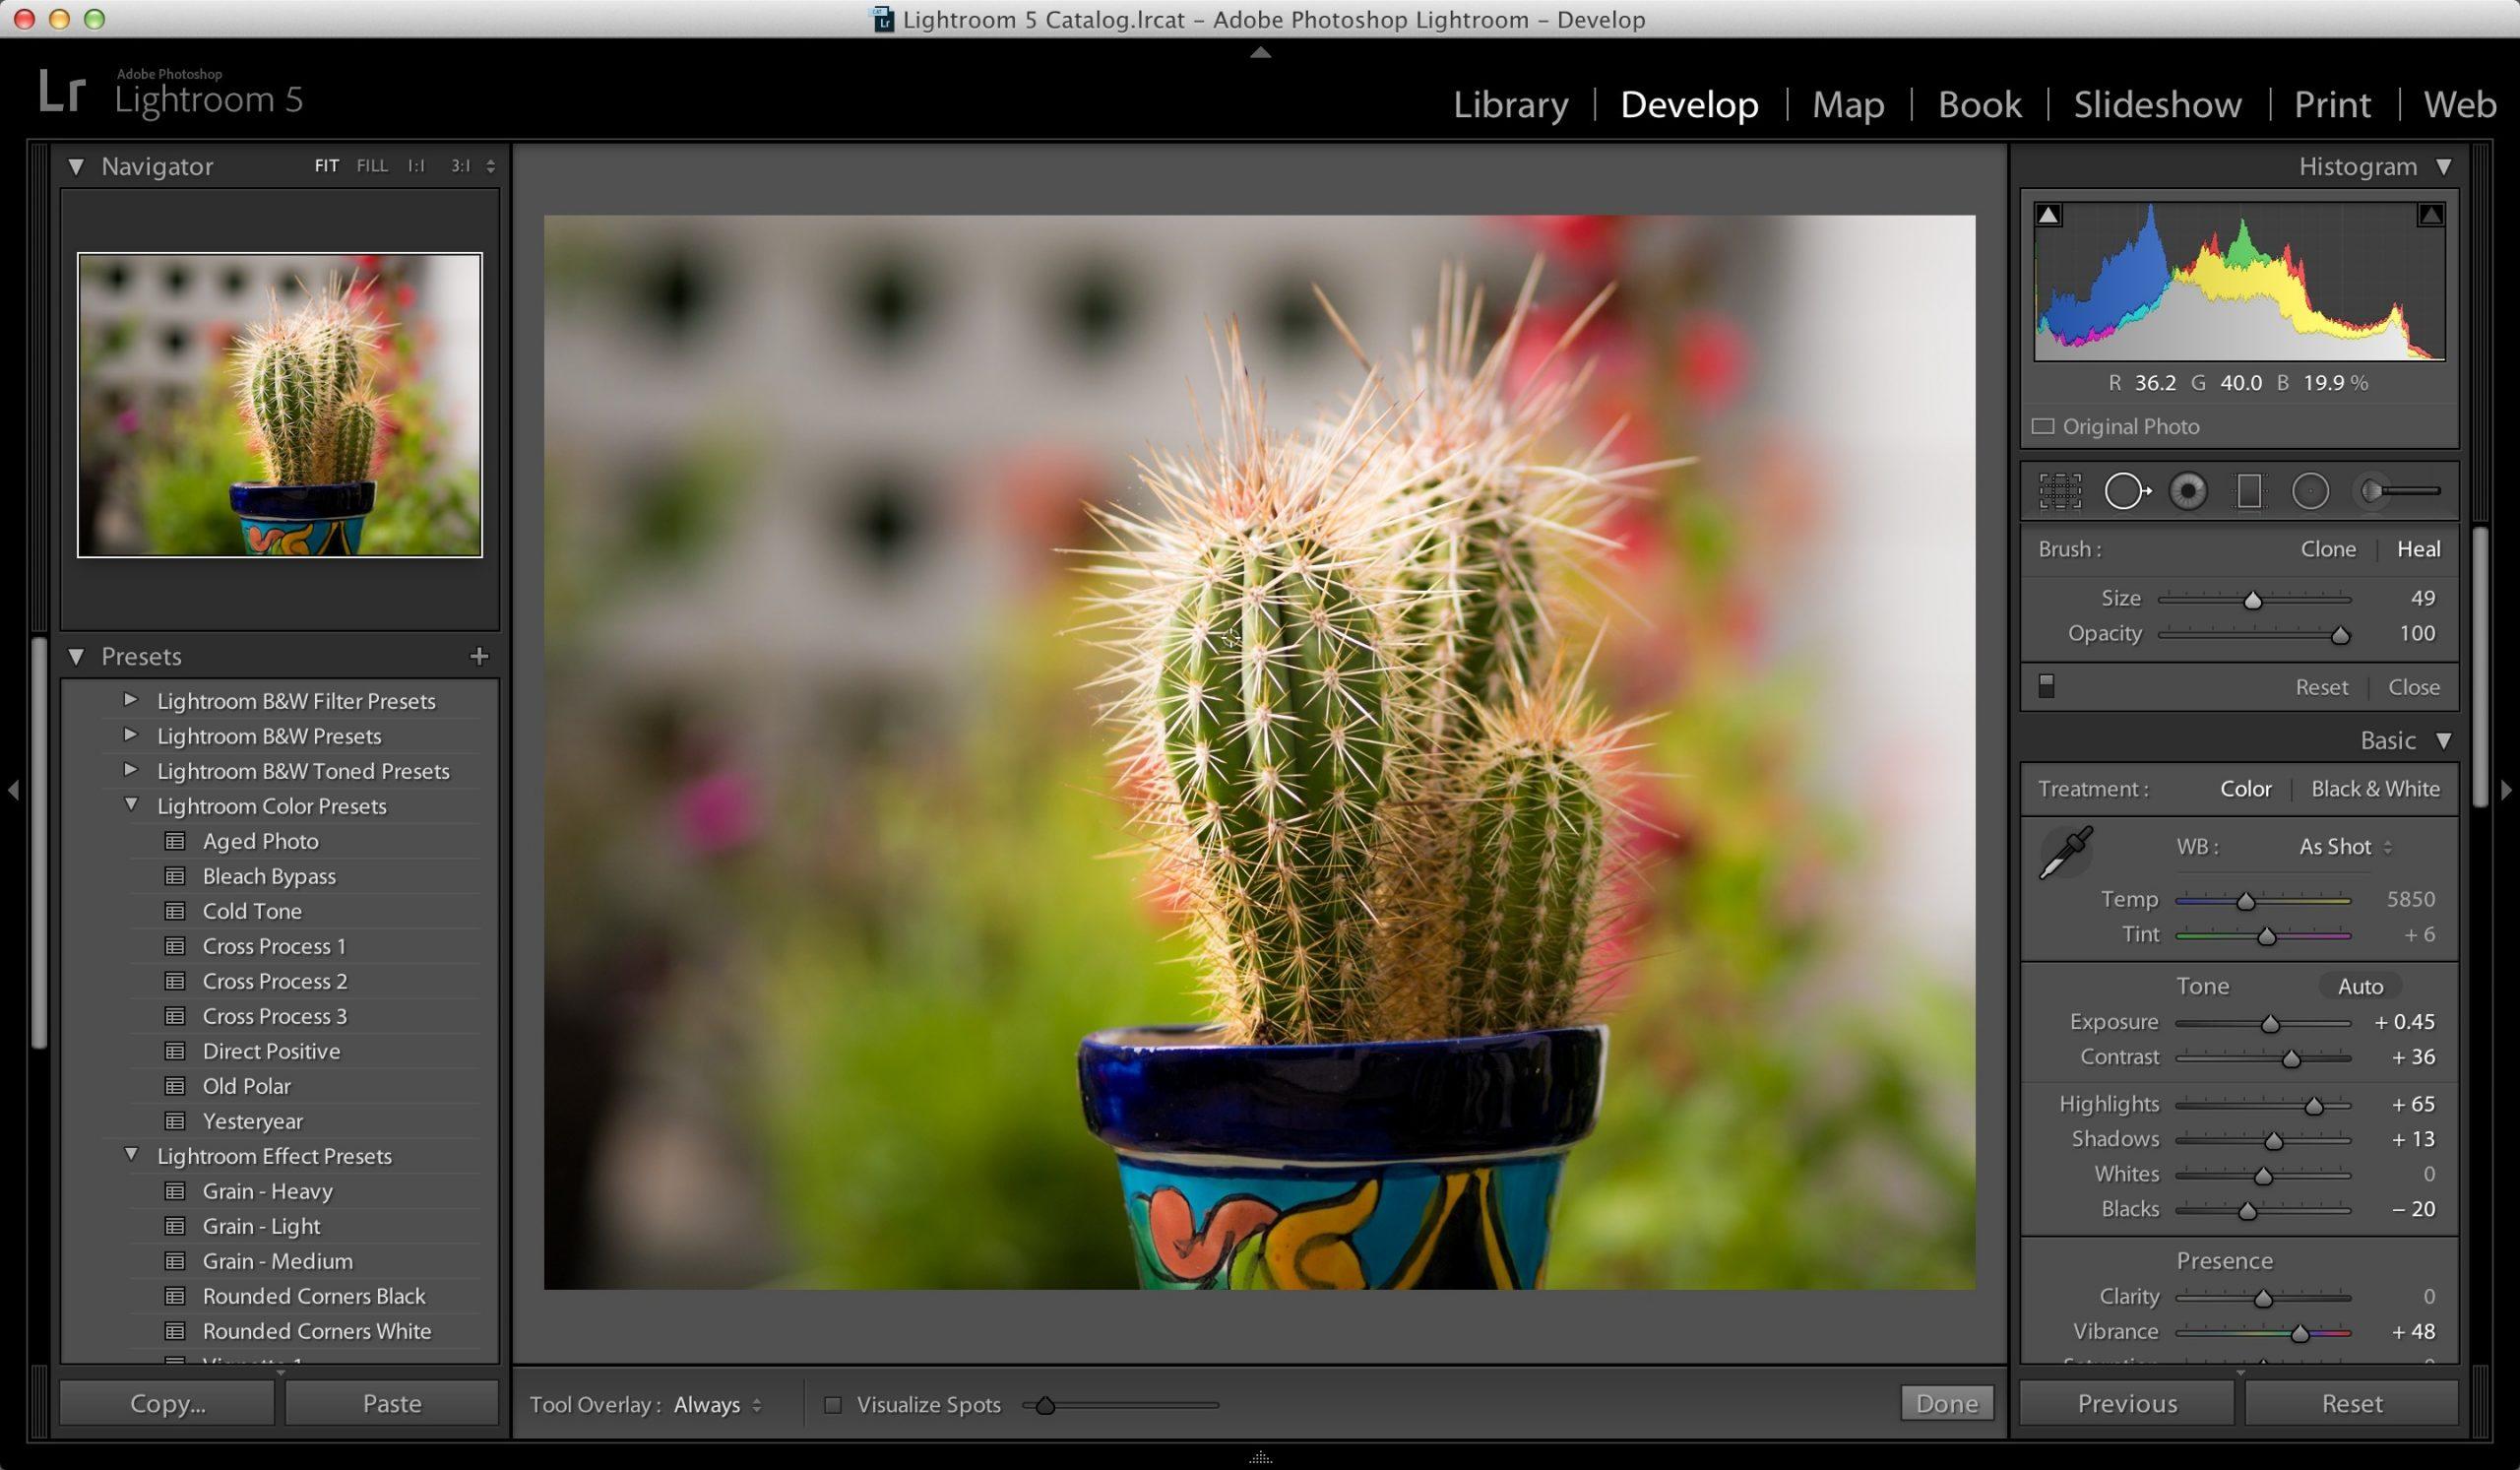 Adobe Lightroom CC Pro 2020 Crack